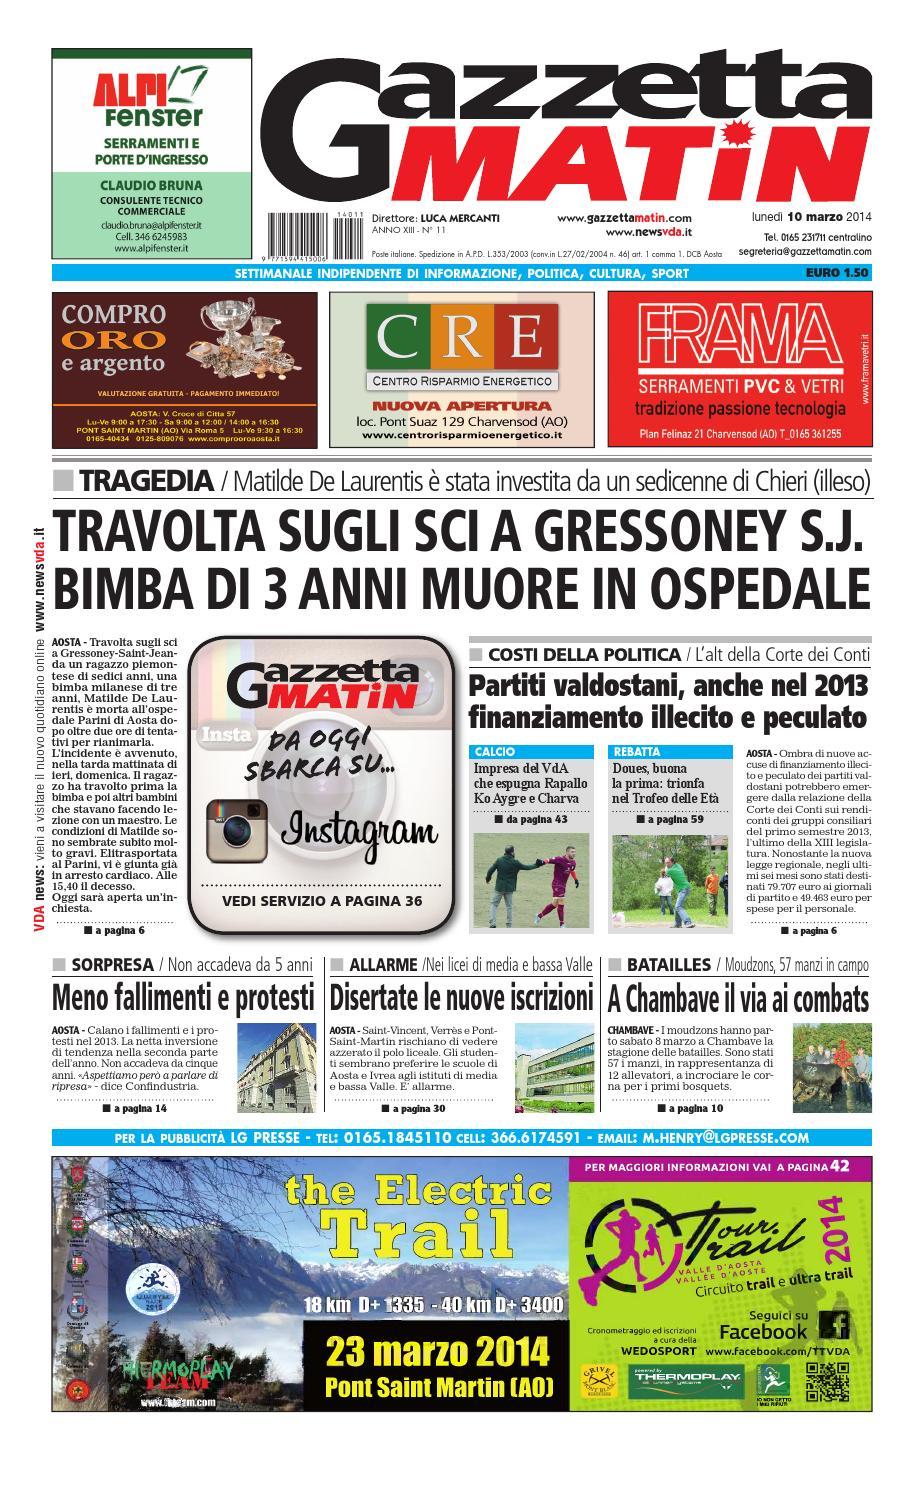 Gazzetta Matin del 10 marzo 2014 by Luca Mercanti - issuu